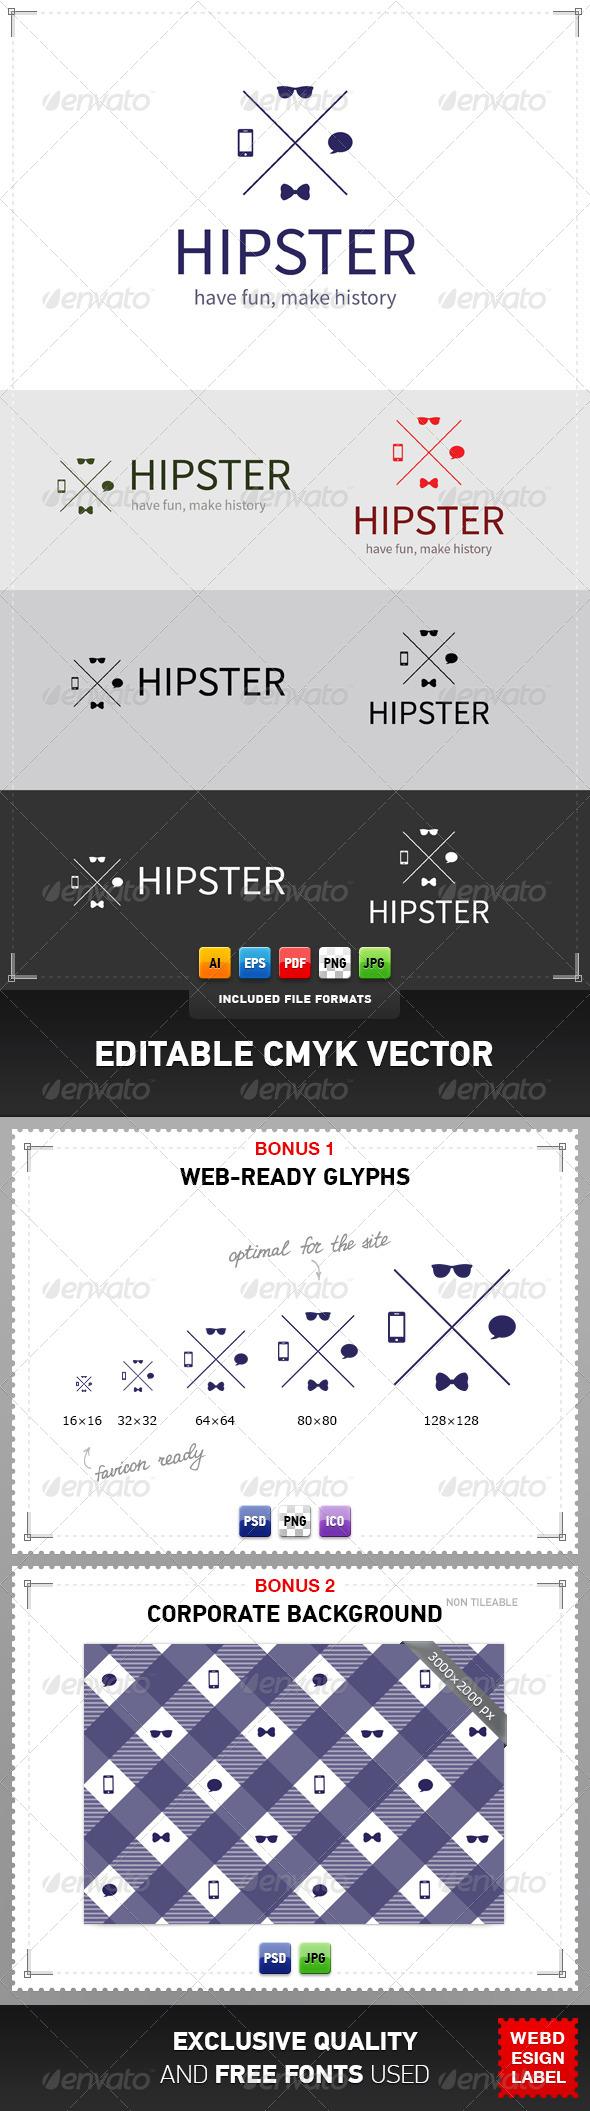 GraphicRiver Hipster Logo 5084114